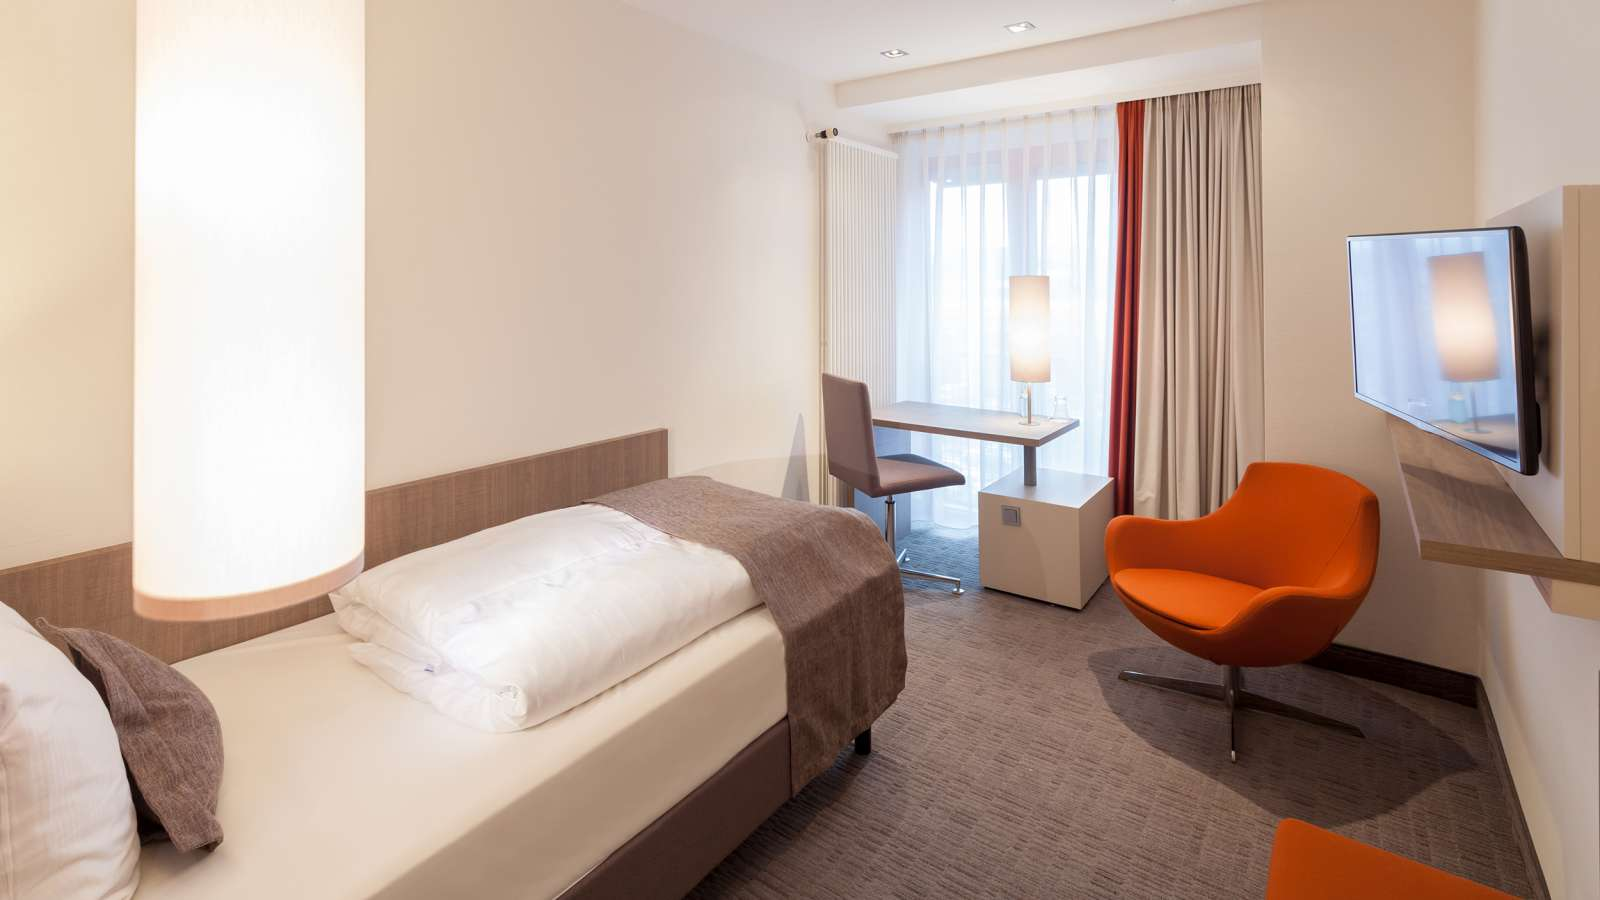 Centro Hotel Kommerz Cologne Germany